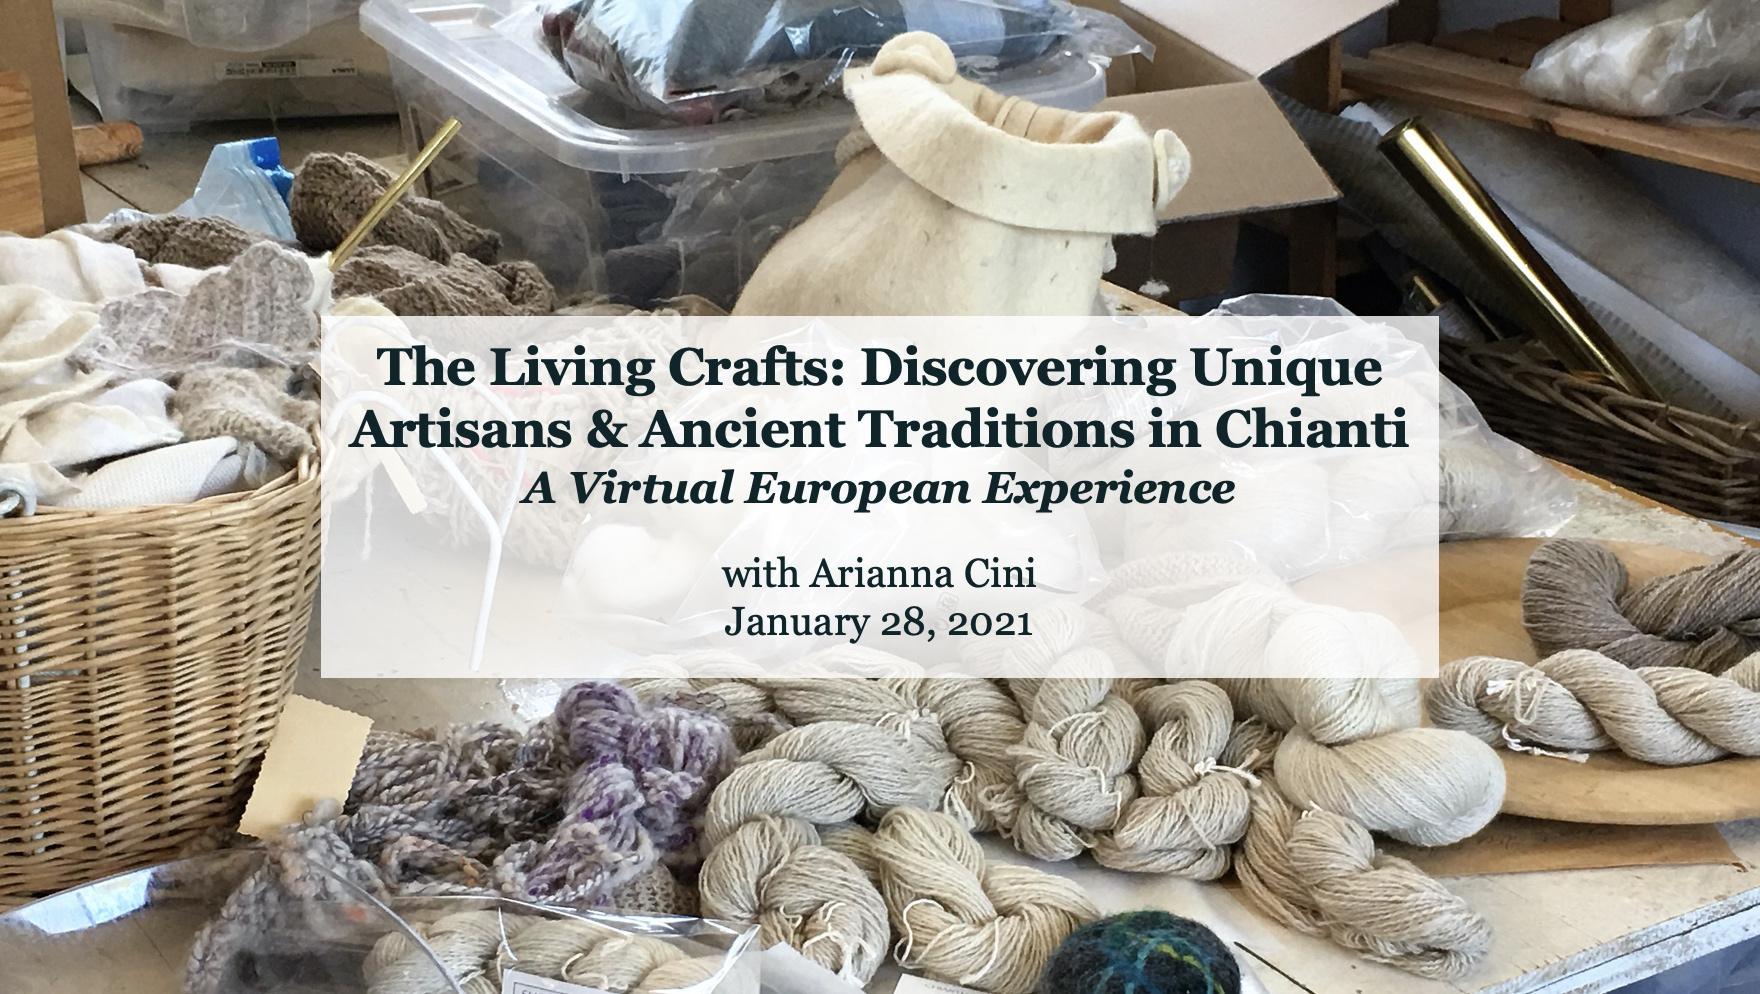 Living Crafts in Chianti